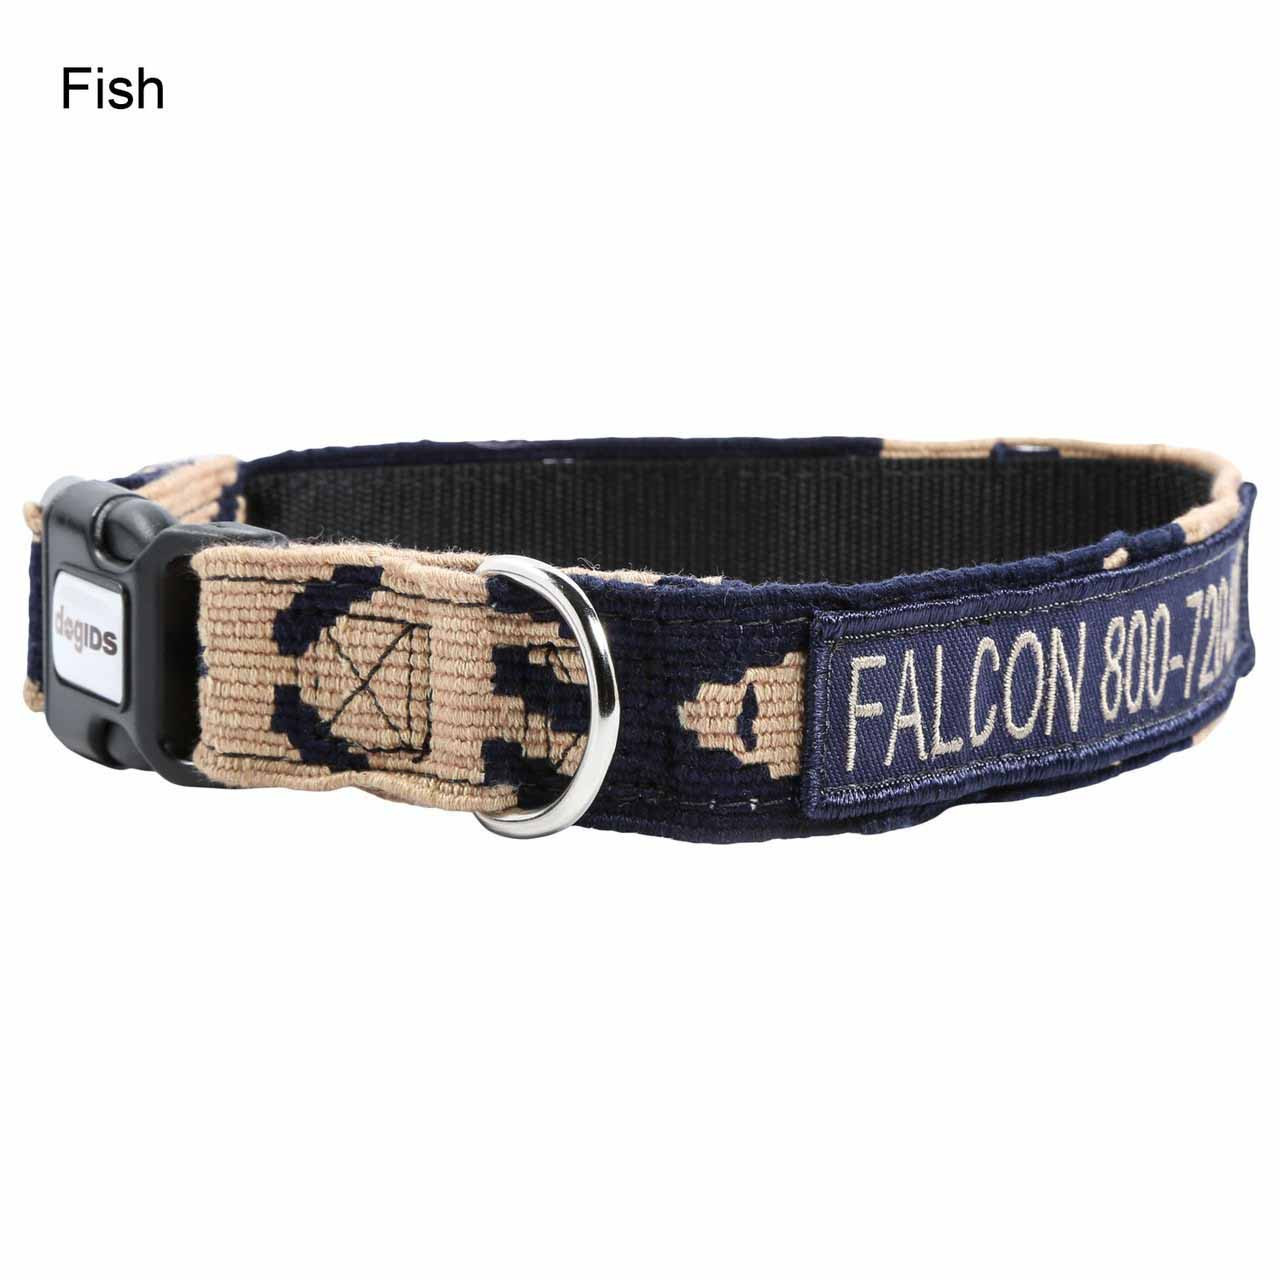 Embroidered Maya Personalized Dog Collar Fish